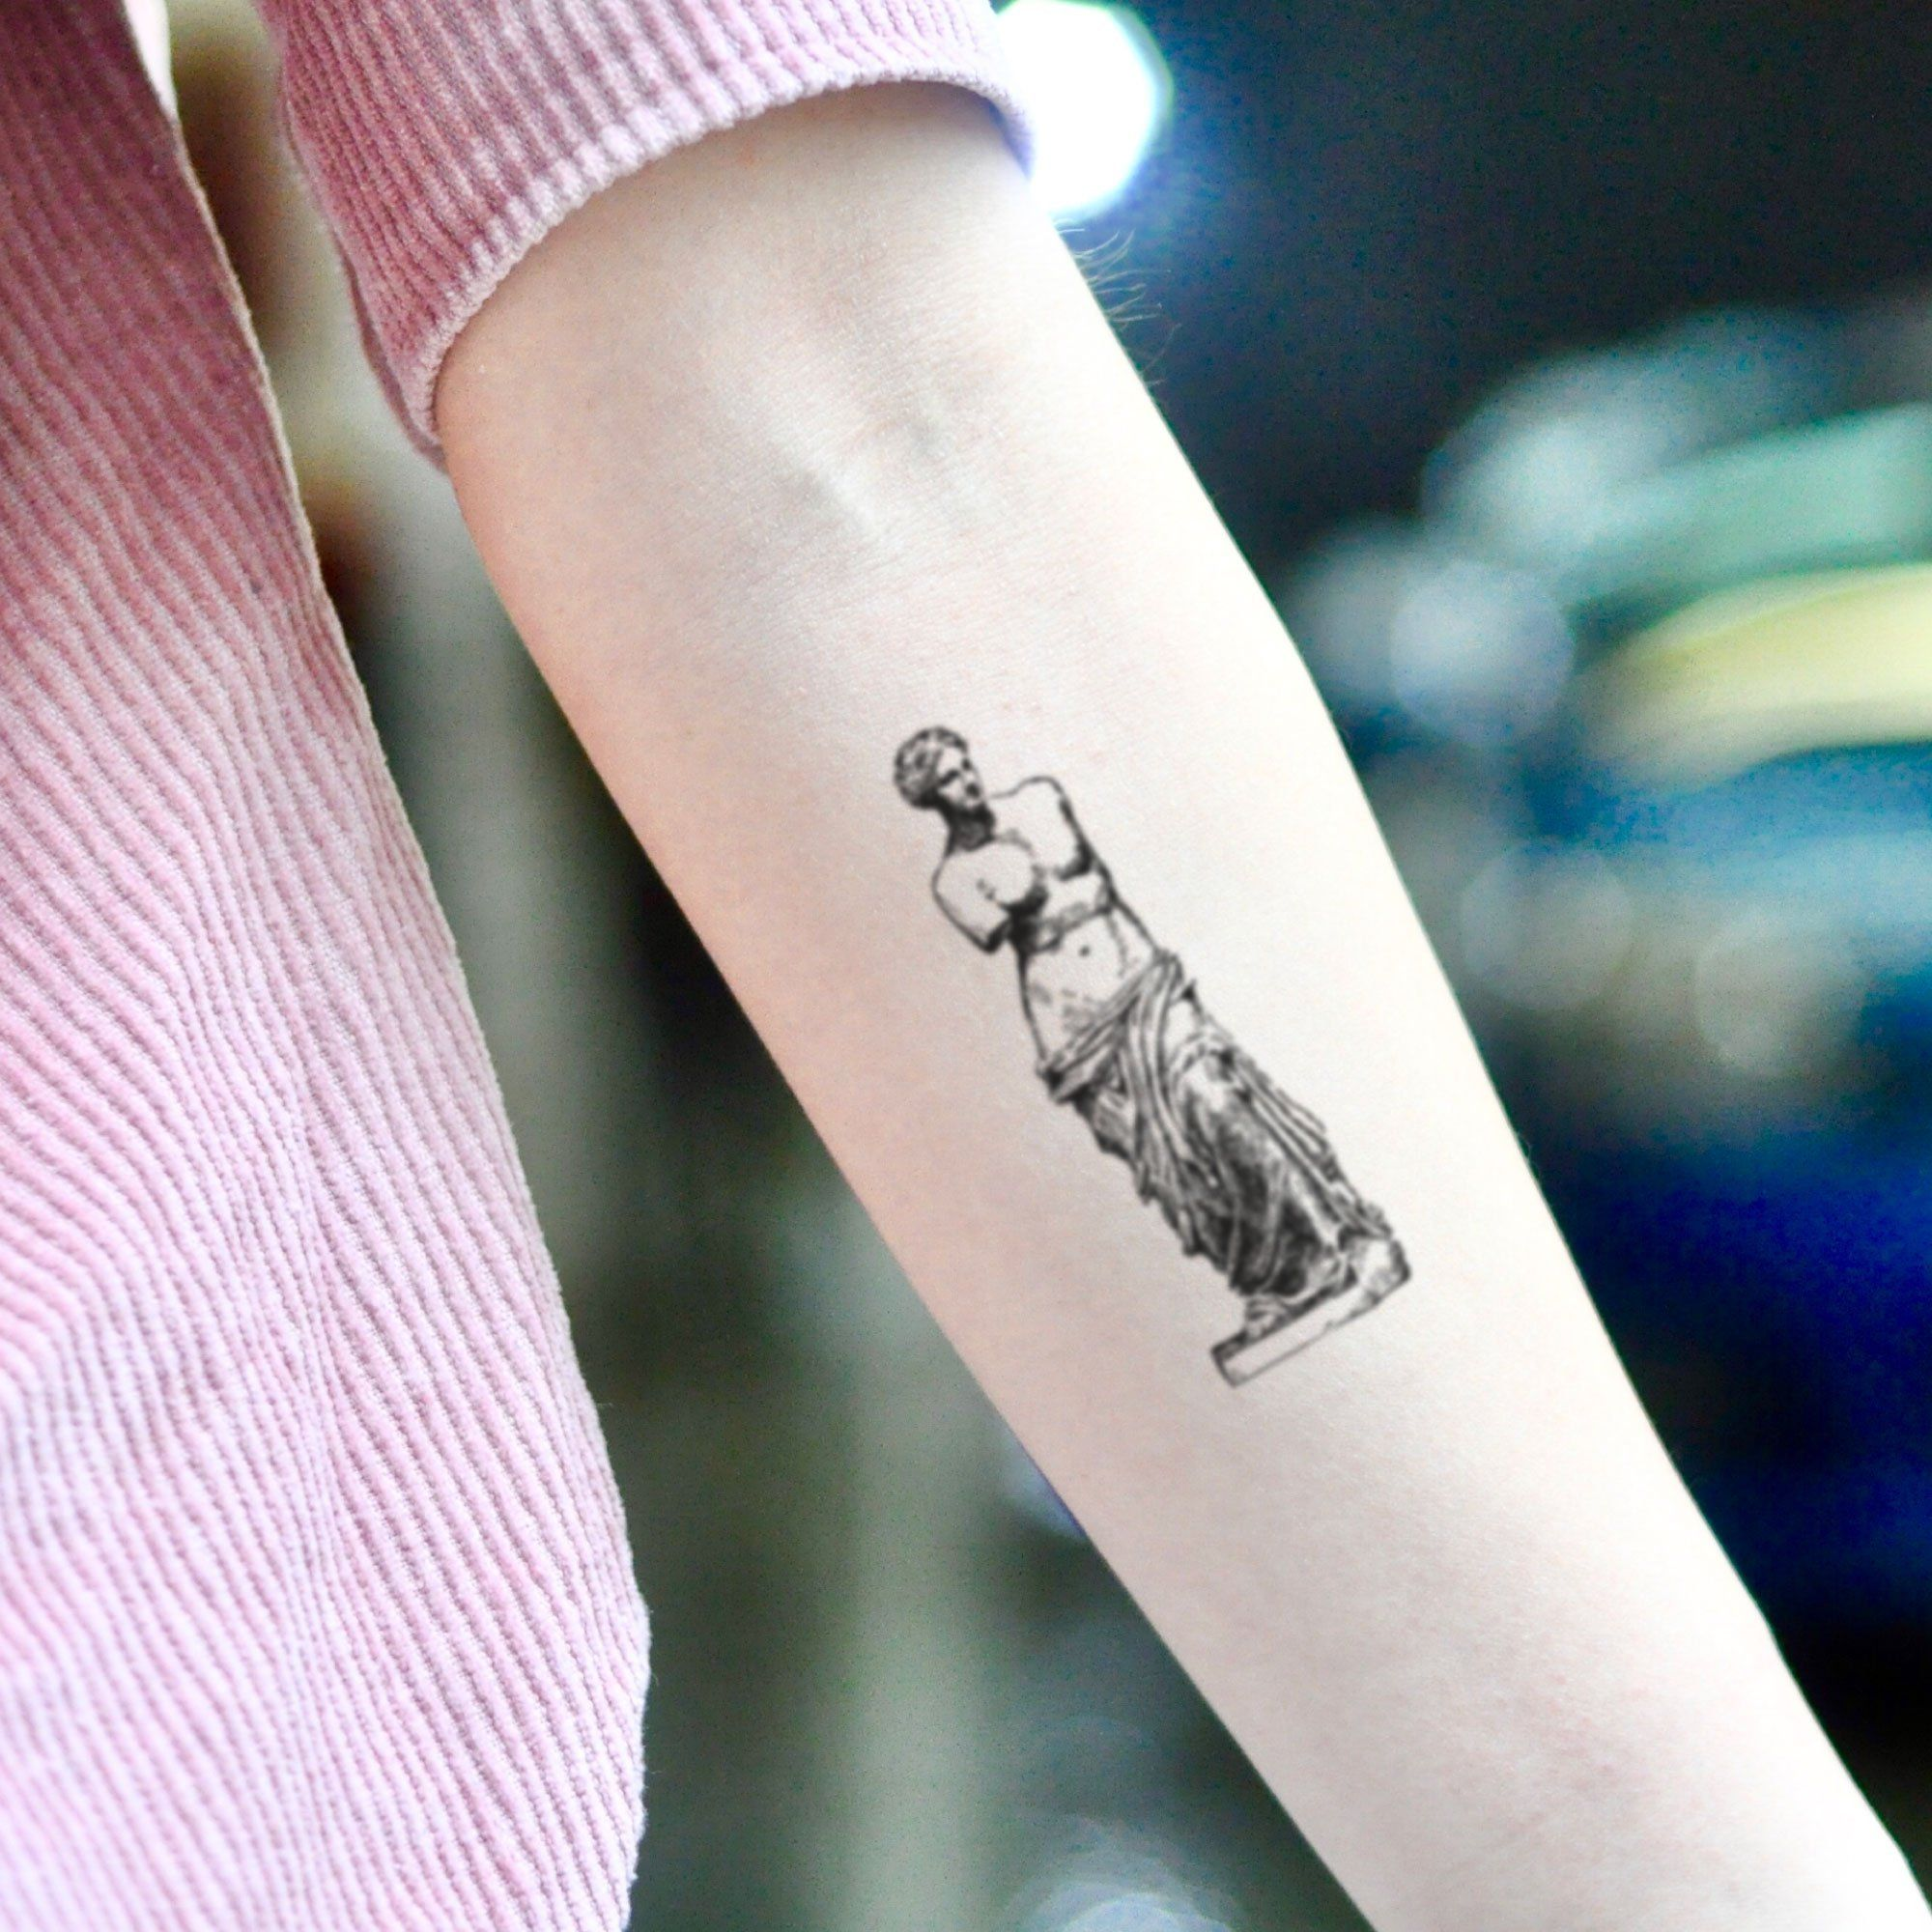 Venus De Milo Temporary Tattoo Sticker (Set of 2) Venus